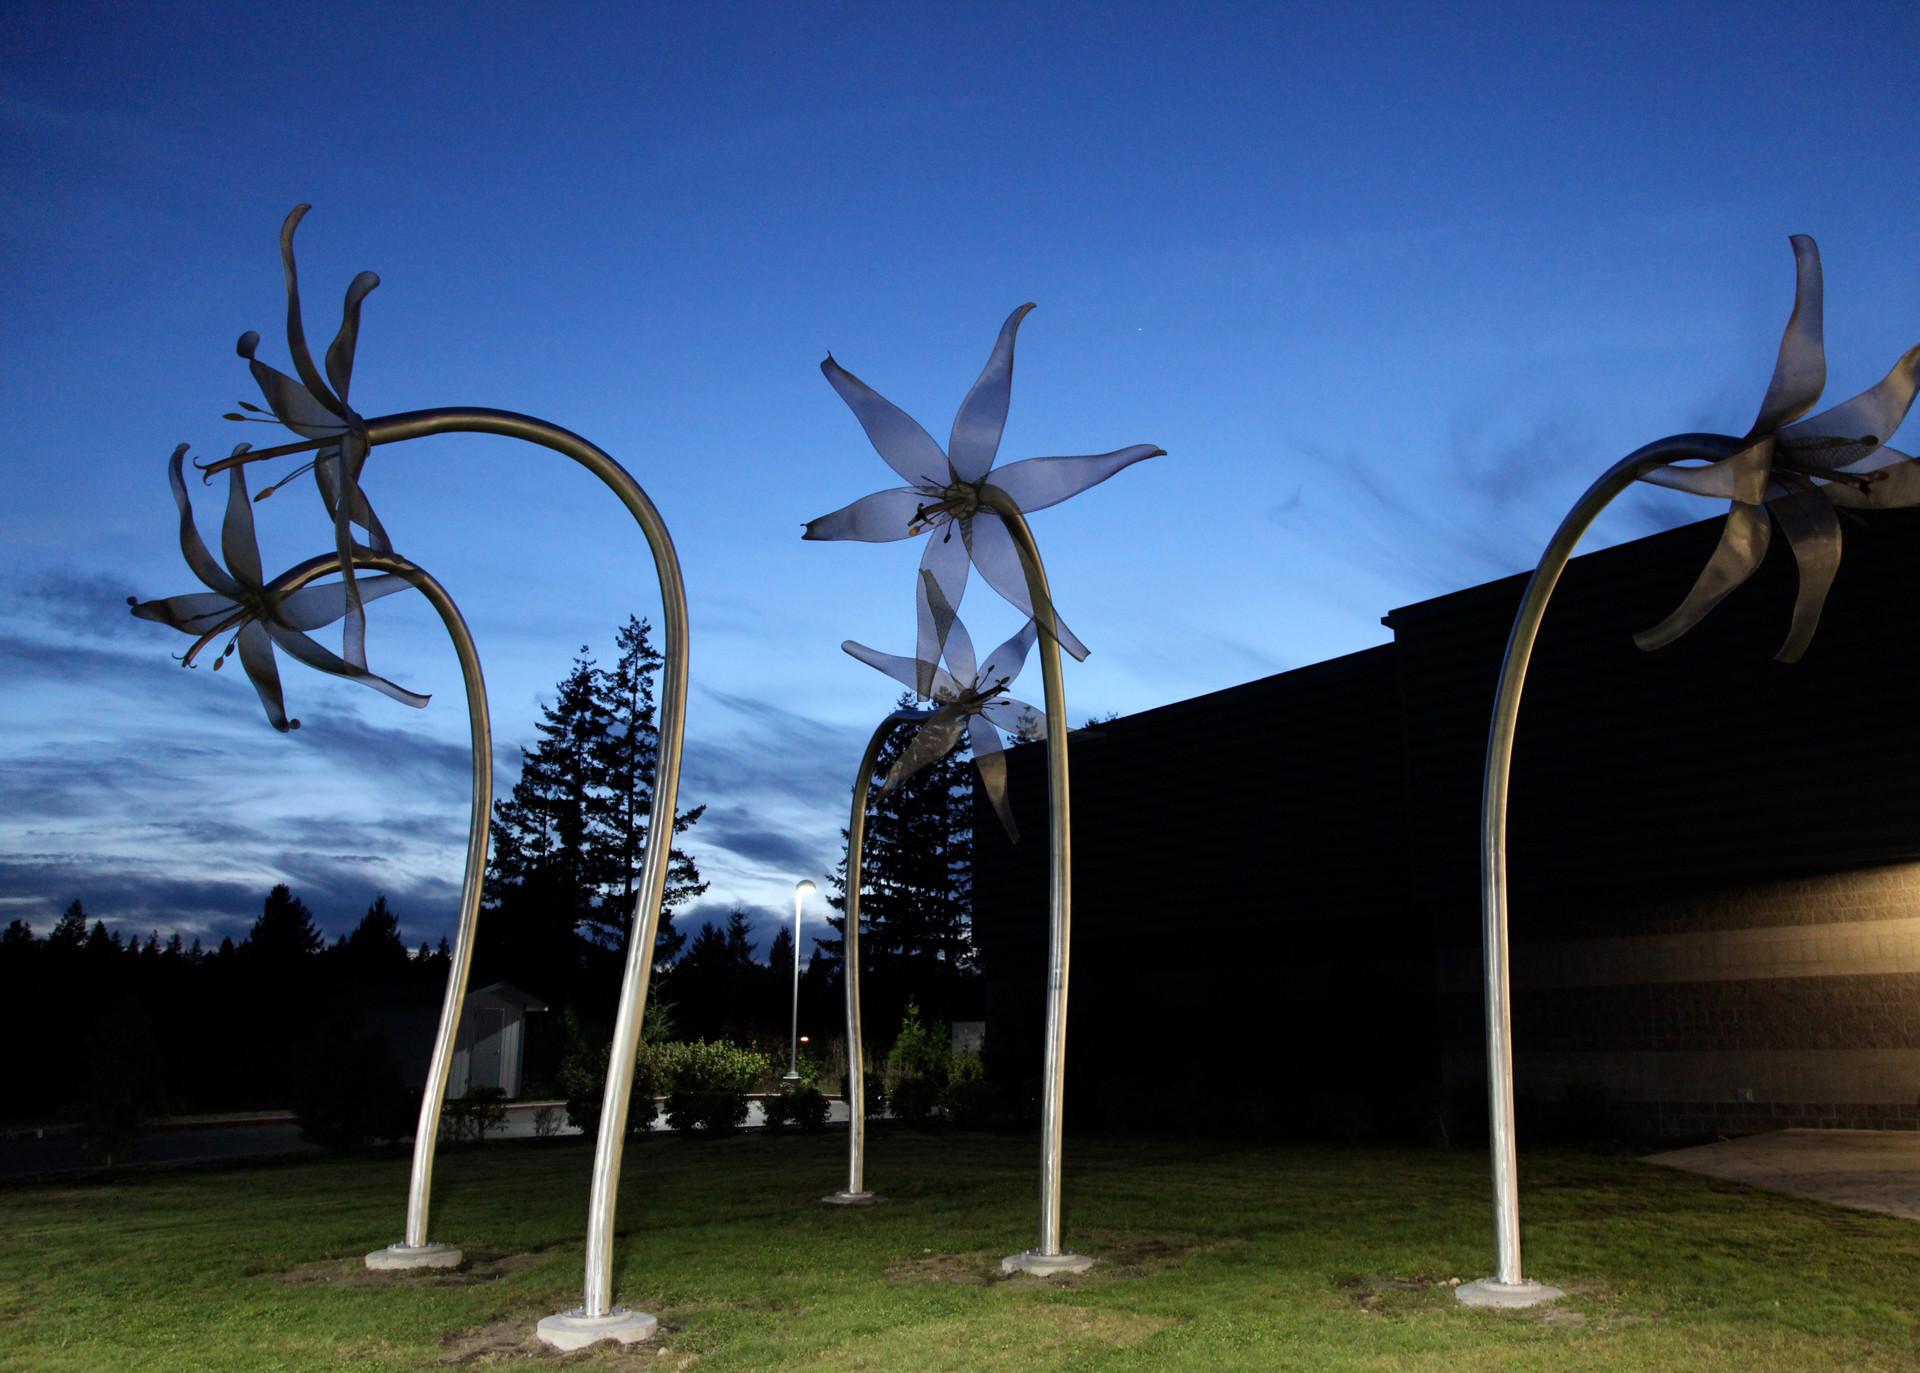 Jim Pridgeon - Puyallup, Washington